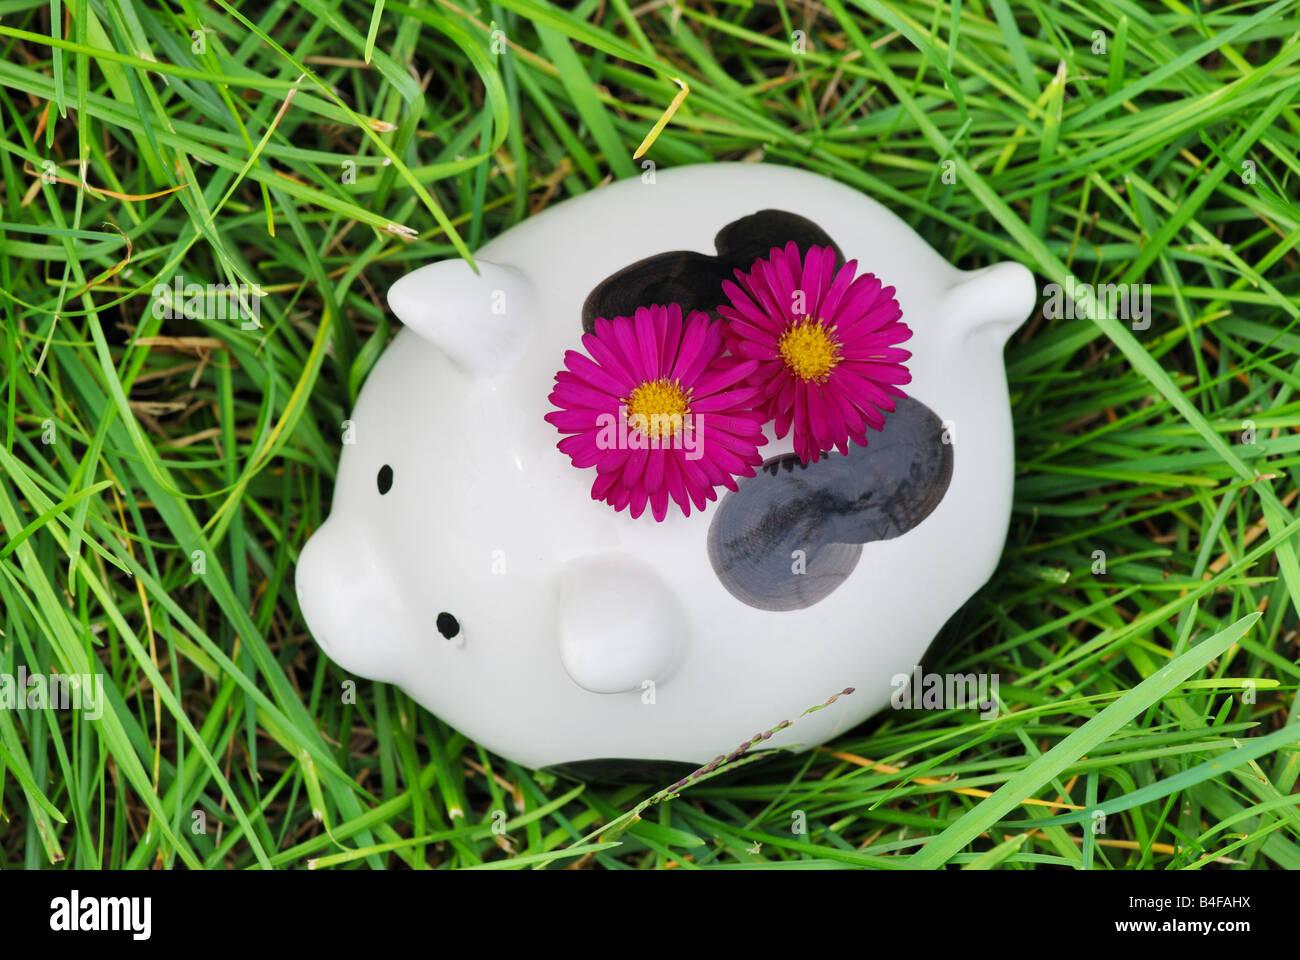 Piggy bank on grass - Stock Image